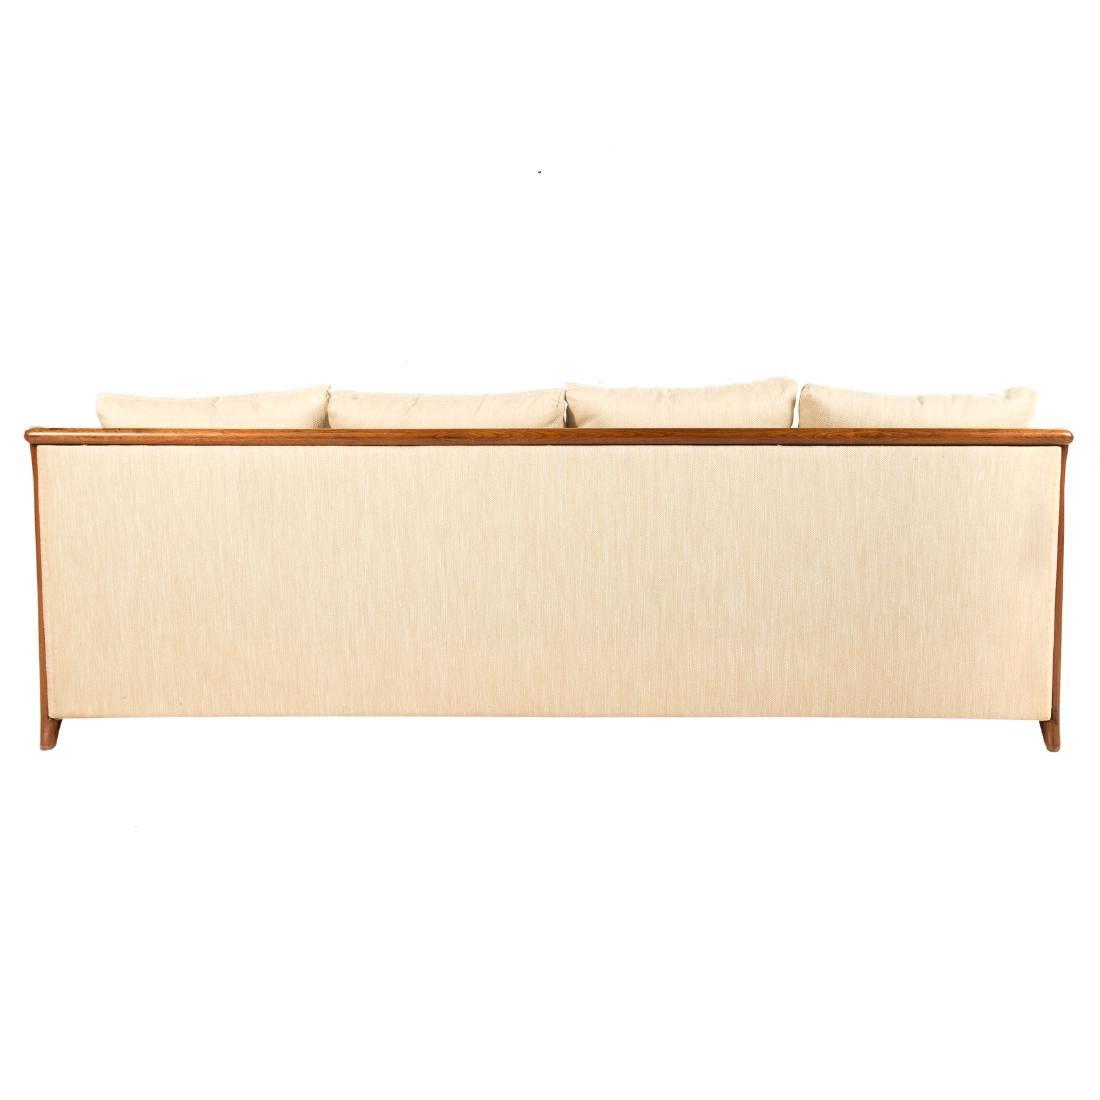 Vladimir Kagan - Dreyfuss walnut upholstered sofa - 7